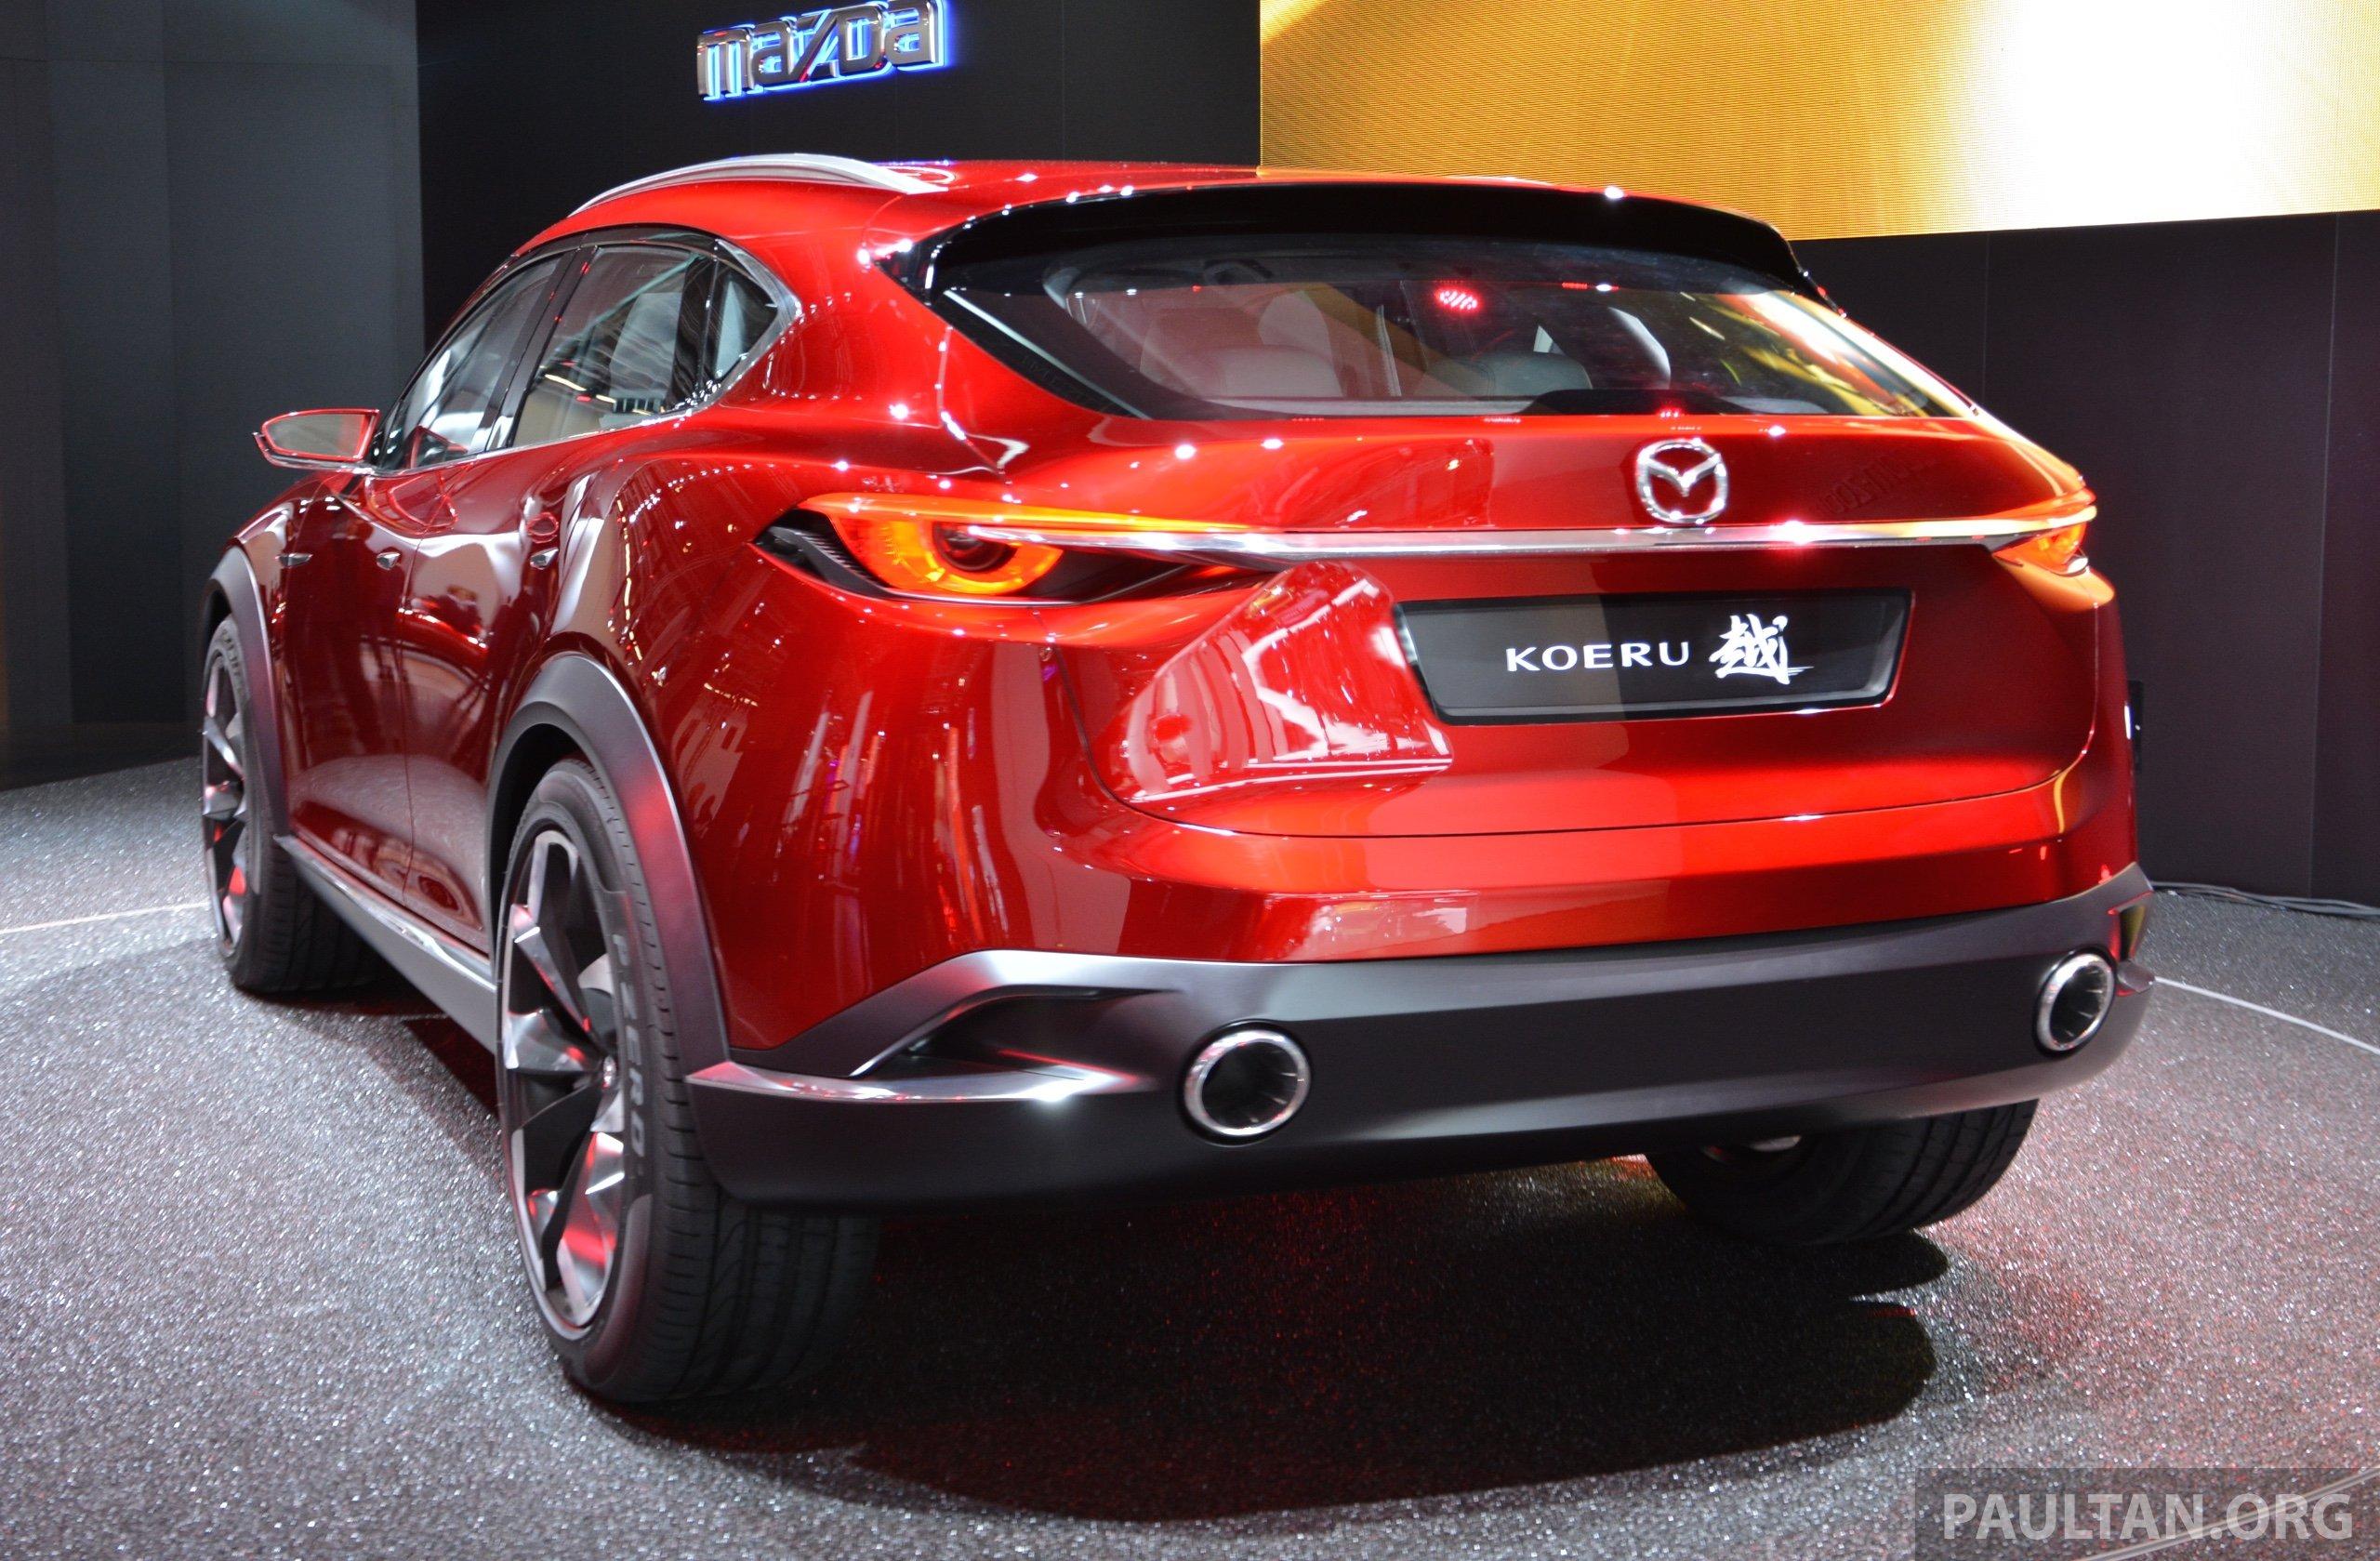 Mazda Cx 9 Skyactiv 2 5 7 moreover 04210100 together with Mazda Cx 5 Gl Price List 1062 in addition 2014 Mazda Cx 5 17 Wheels And Tires 56095 in addition White. on mazda cx 5